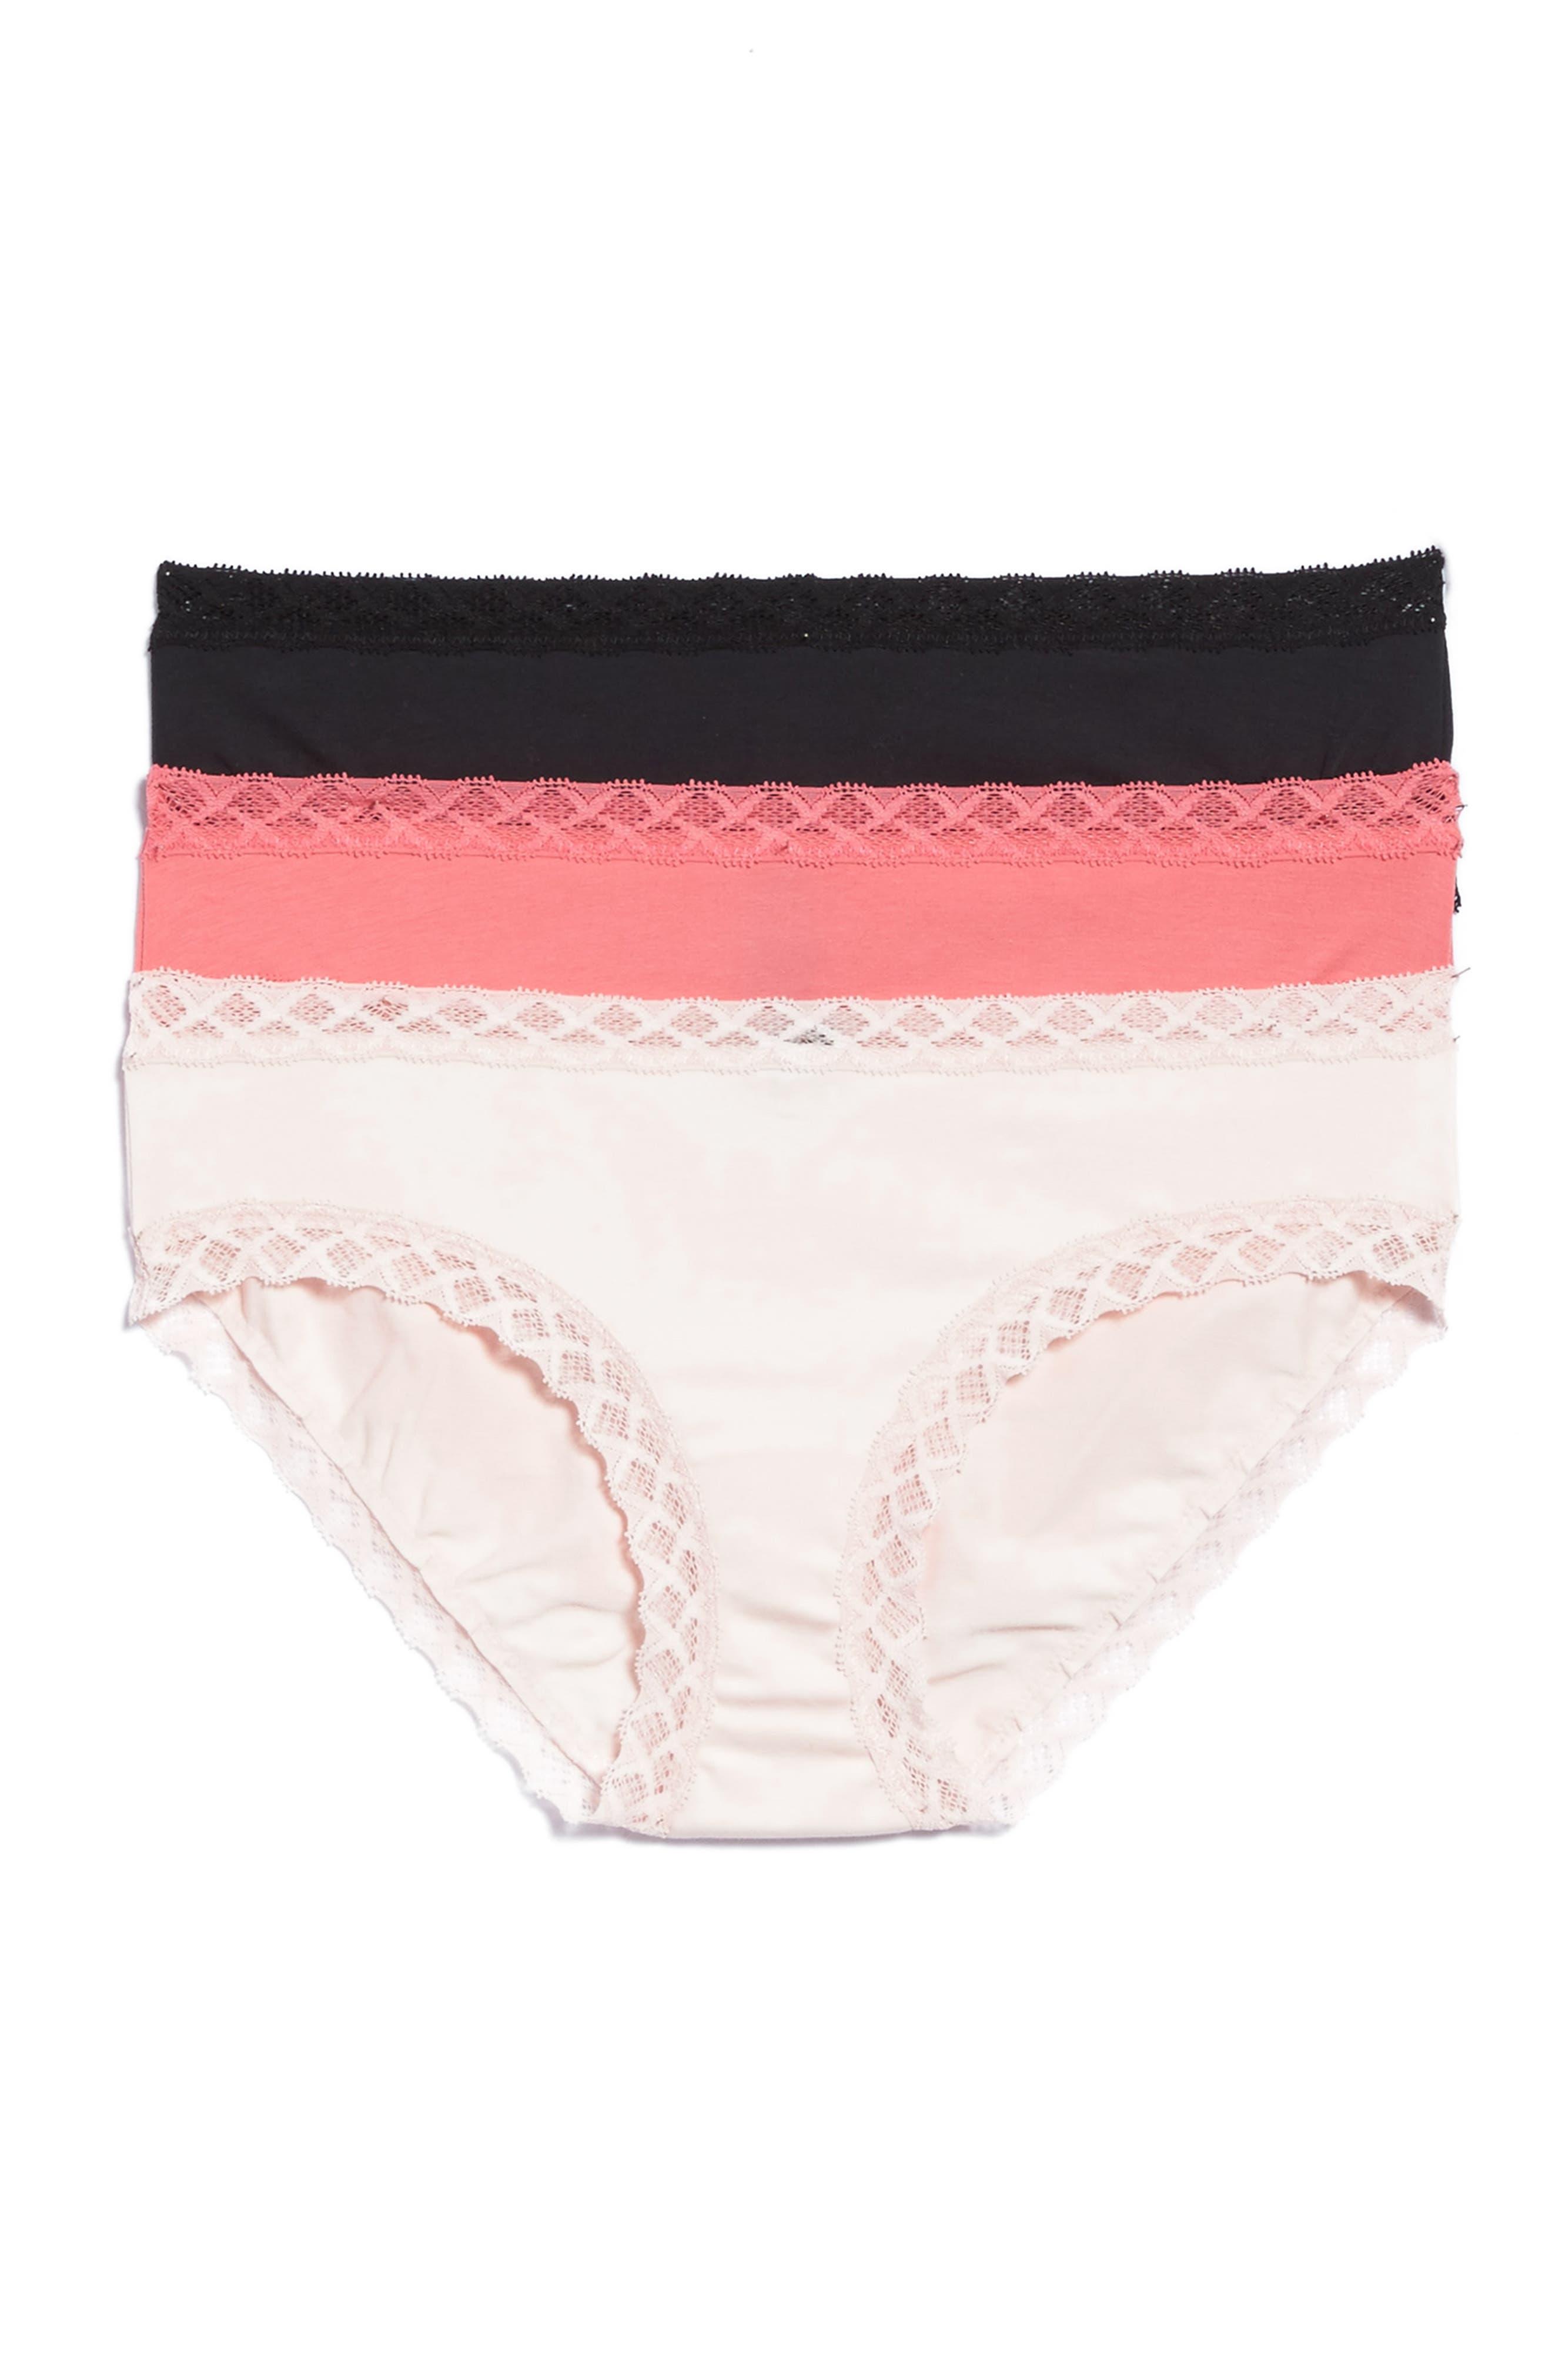 NATORI Bliss 3-Pack Cotton Girl Briefs